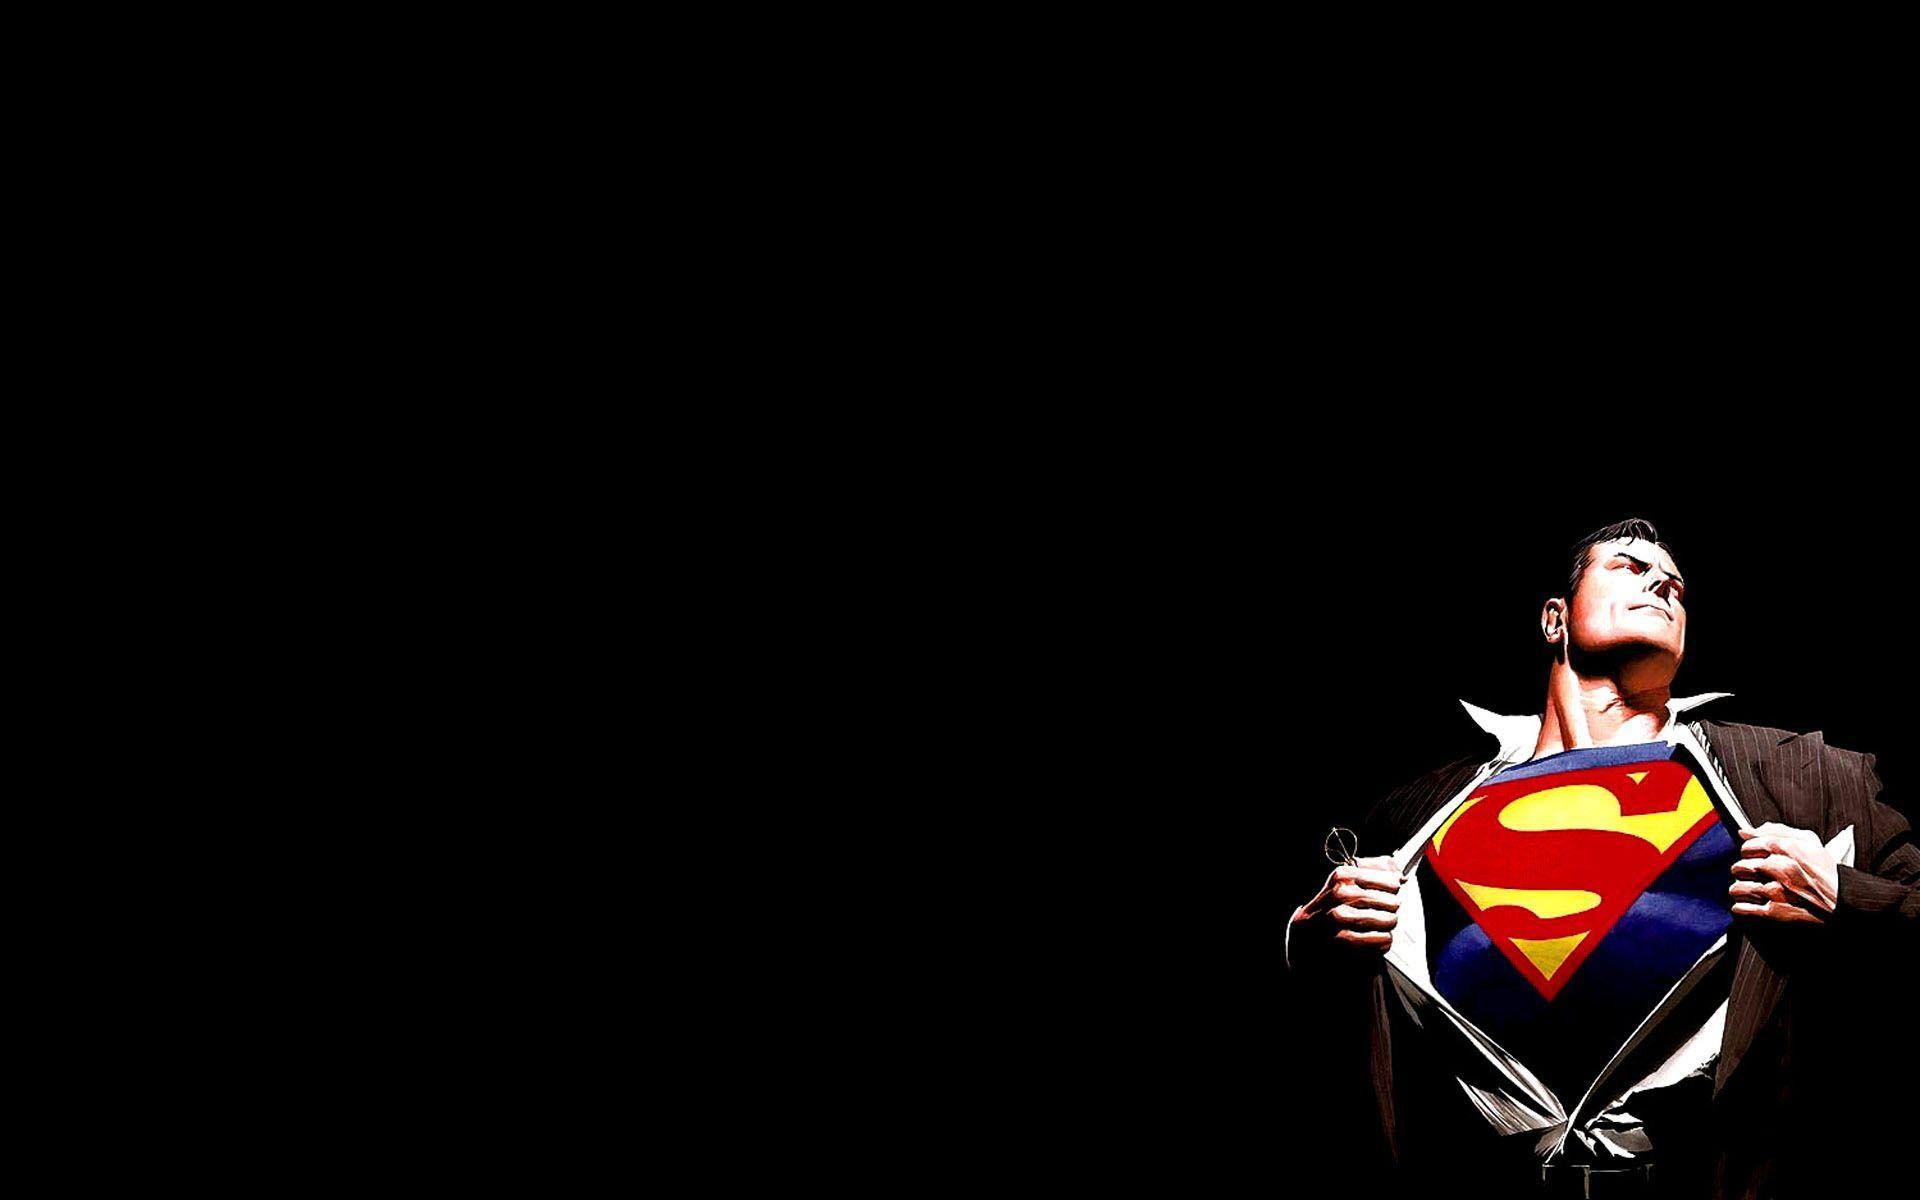 new superman wallpapers wallpaper cave